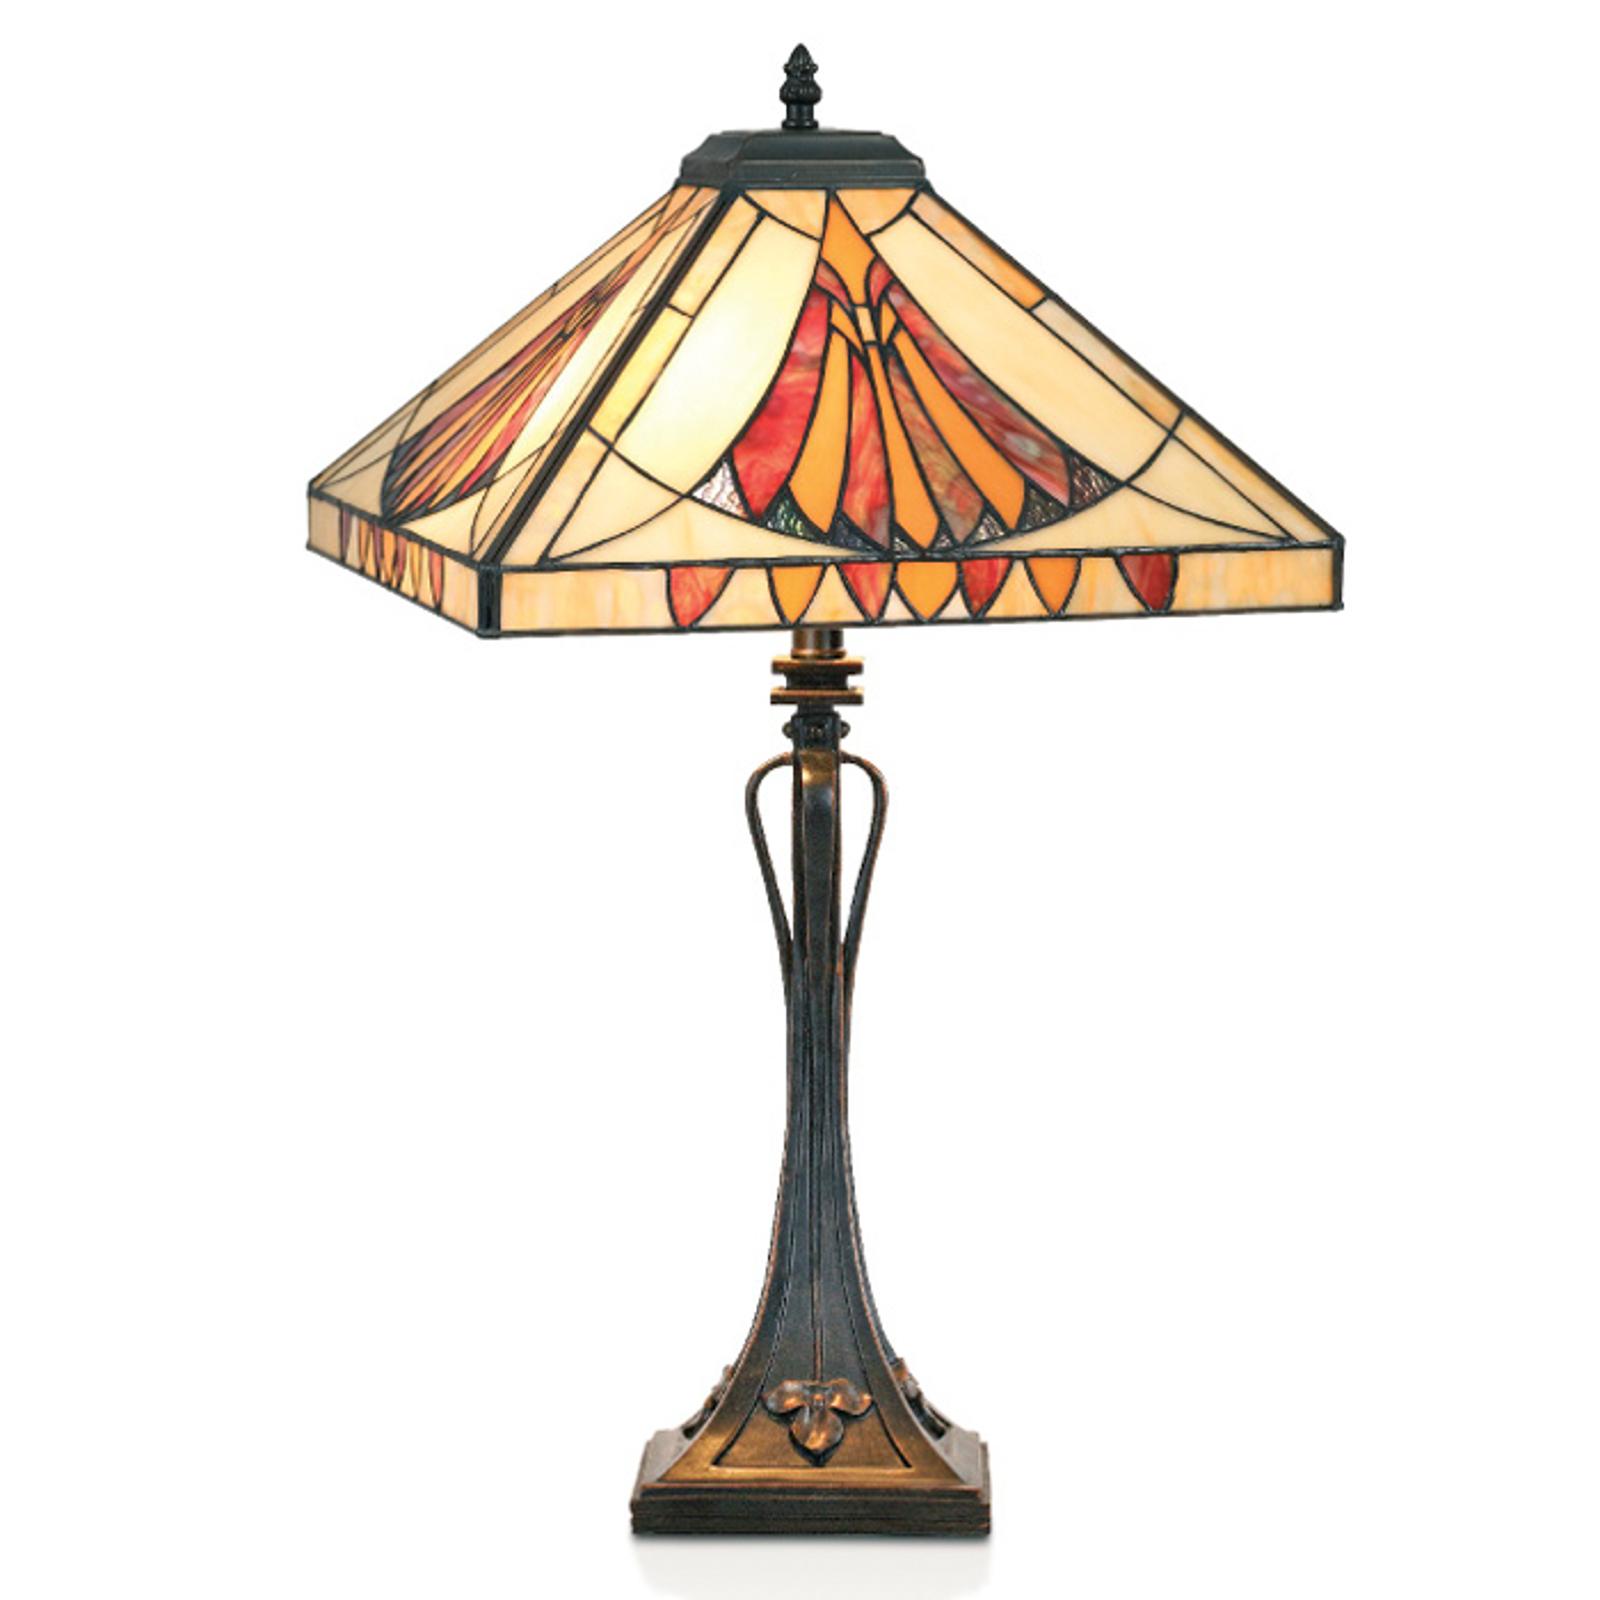 Charmig bordslampa AMALIA i tiffanystil